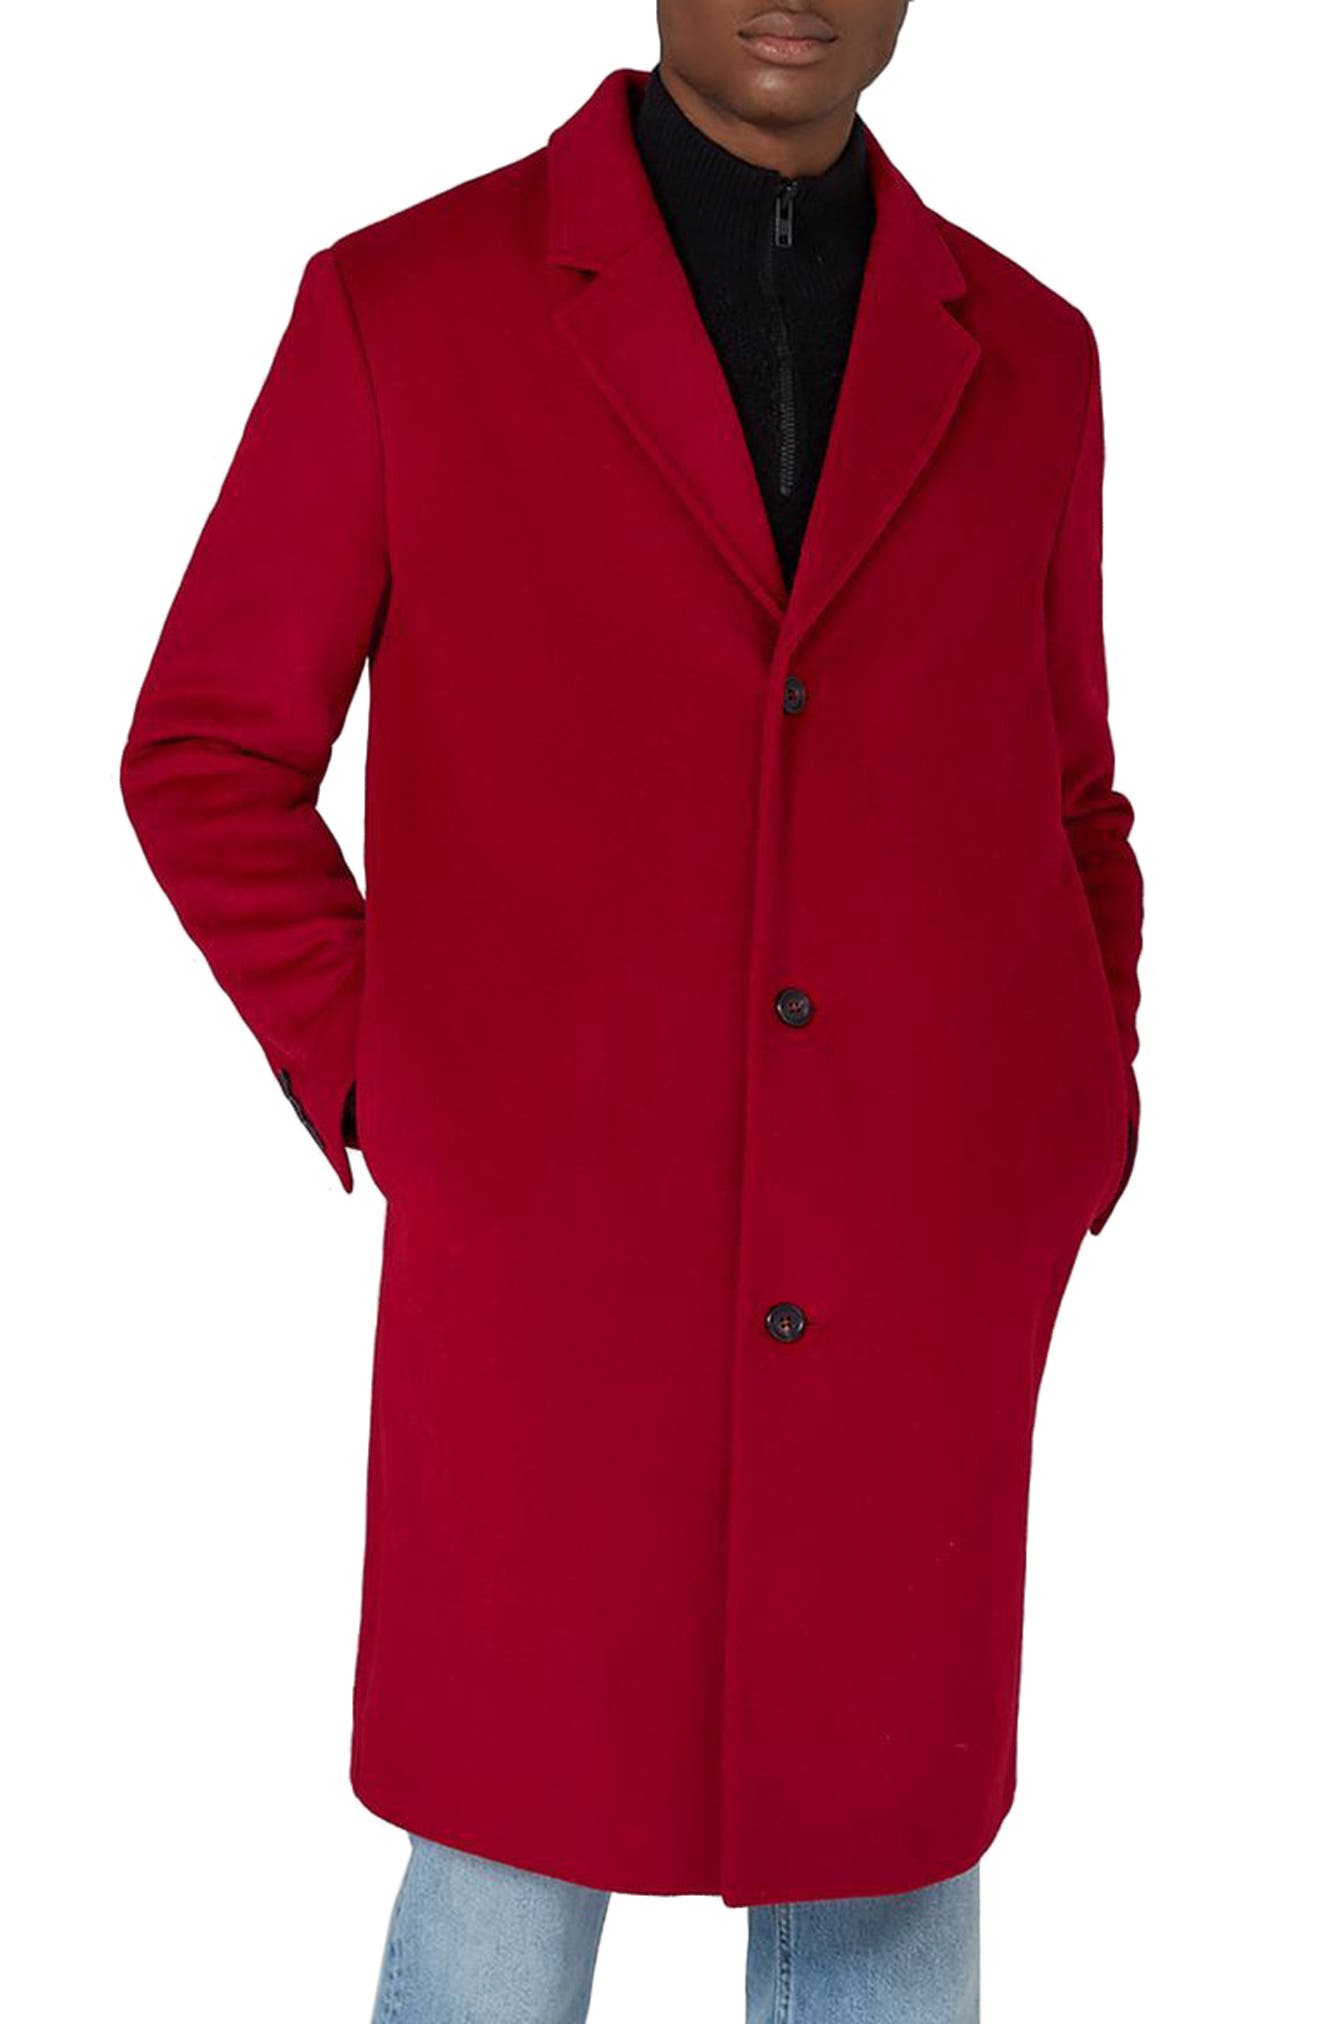 Topman Oversized Single Breasted Coat